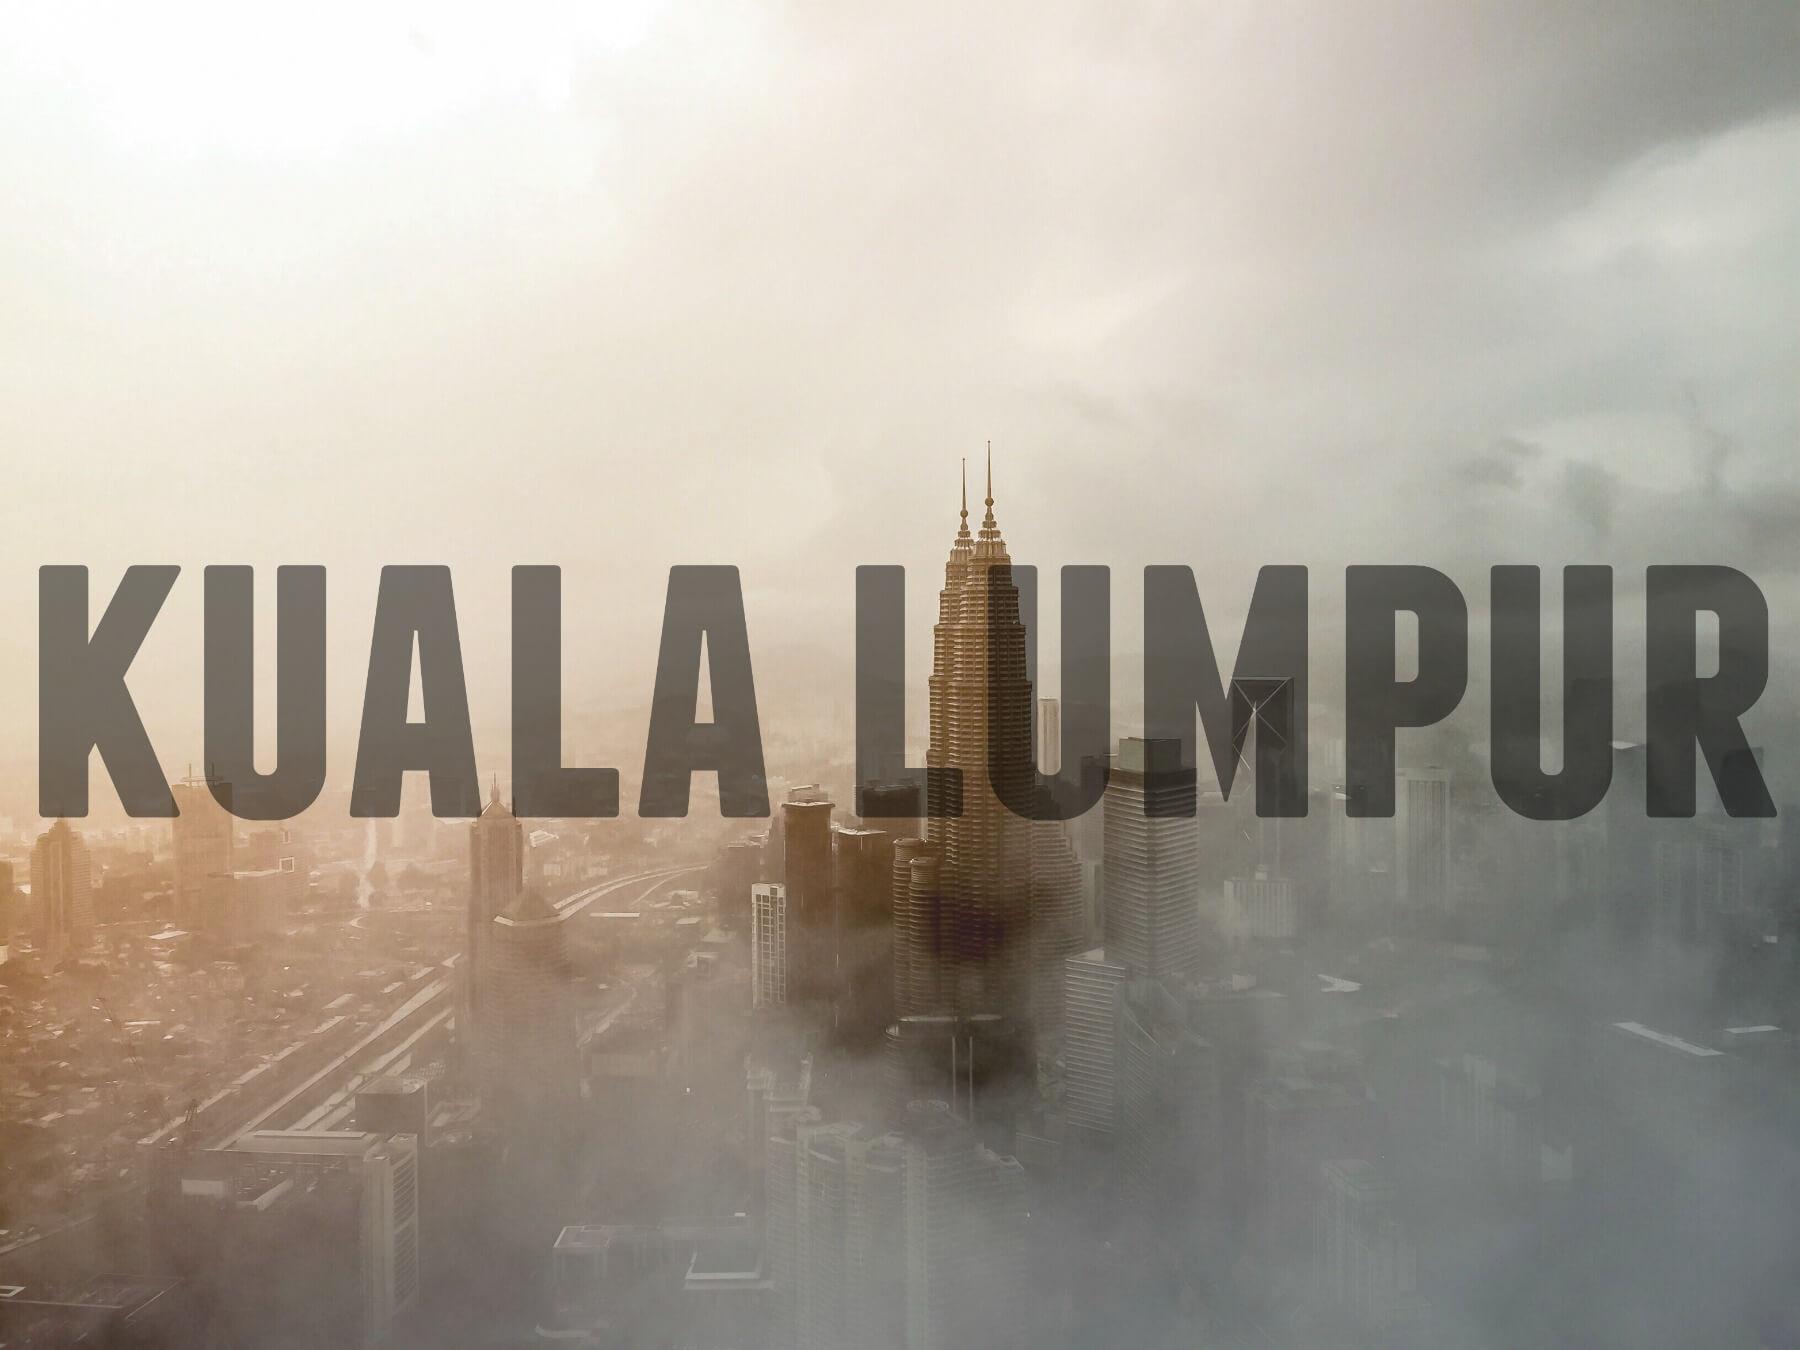 Foggy Kuala Lumpur skies with text overlay - Kuala Lumpur